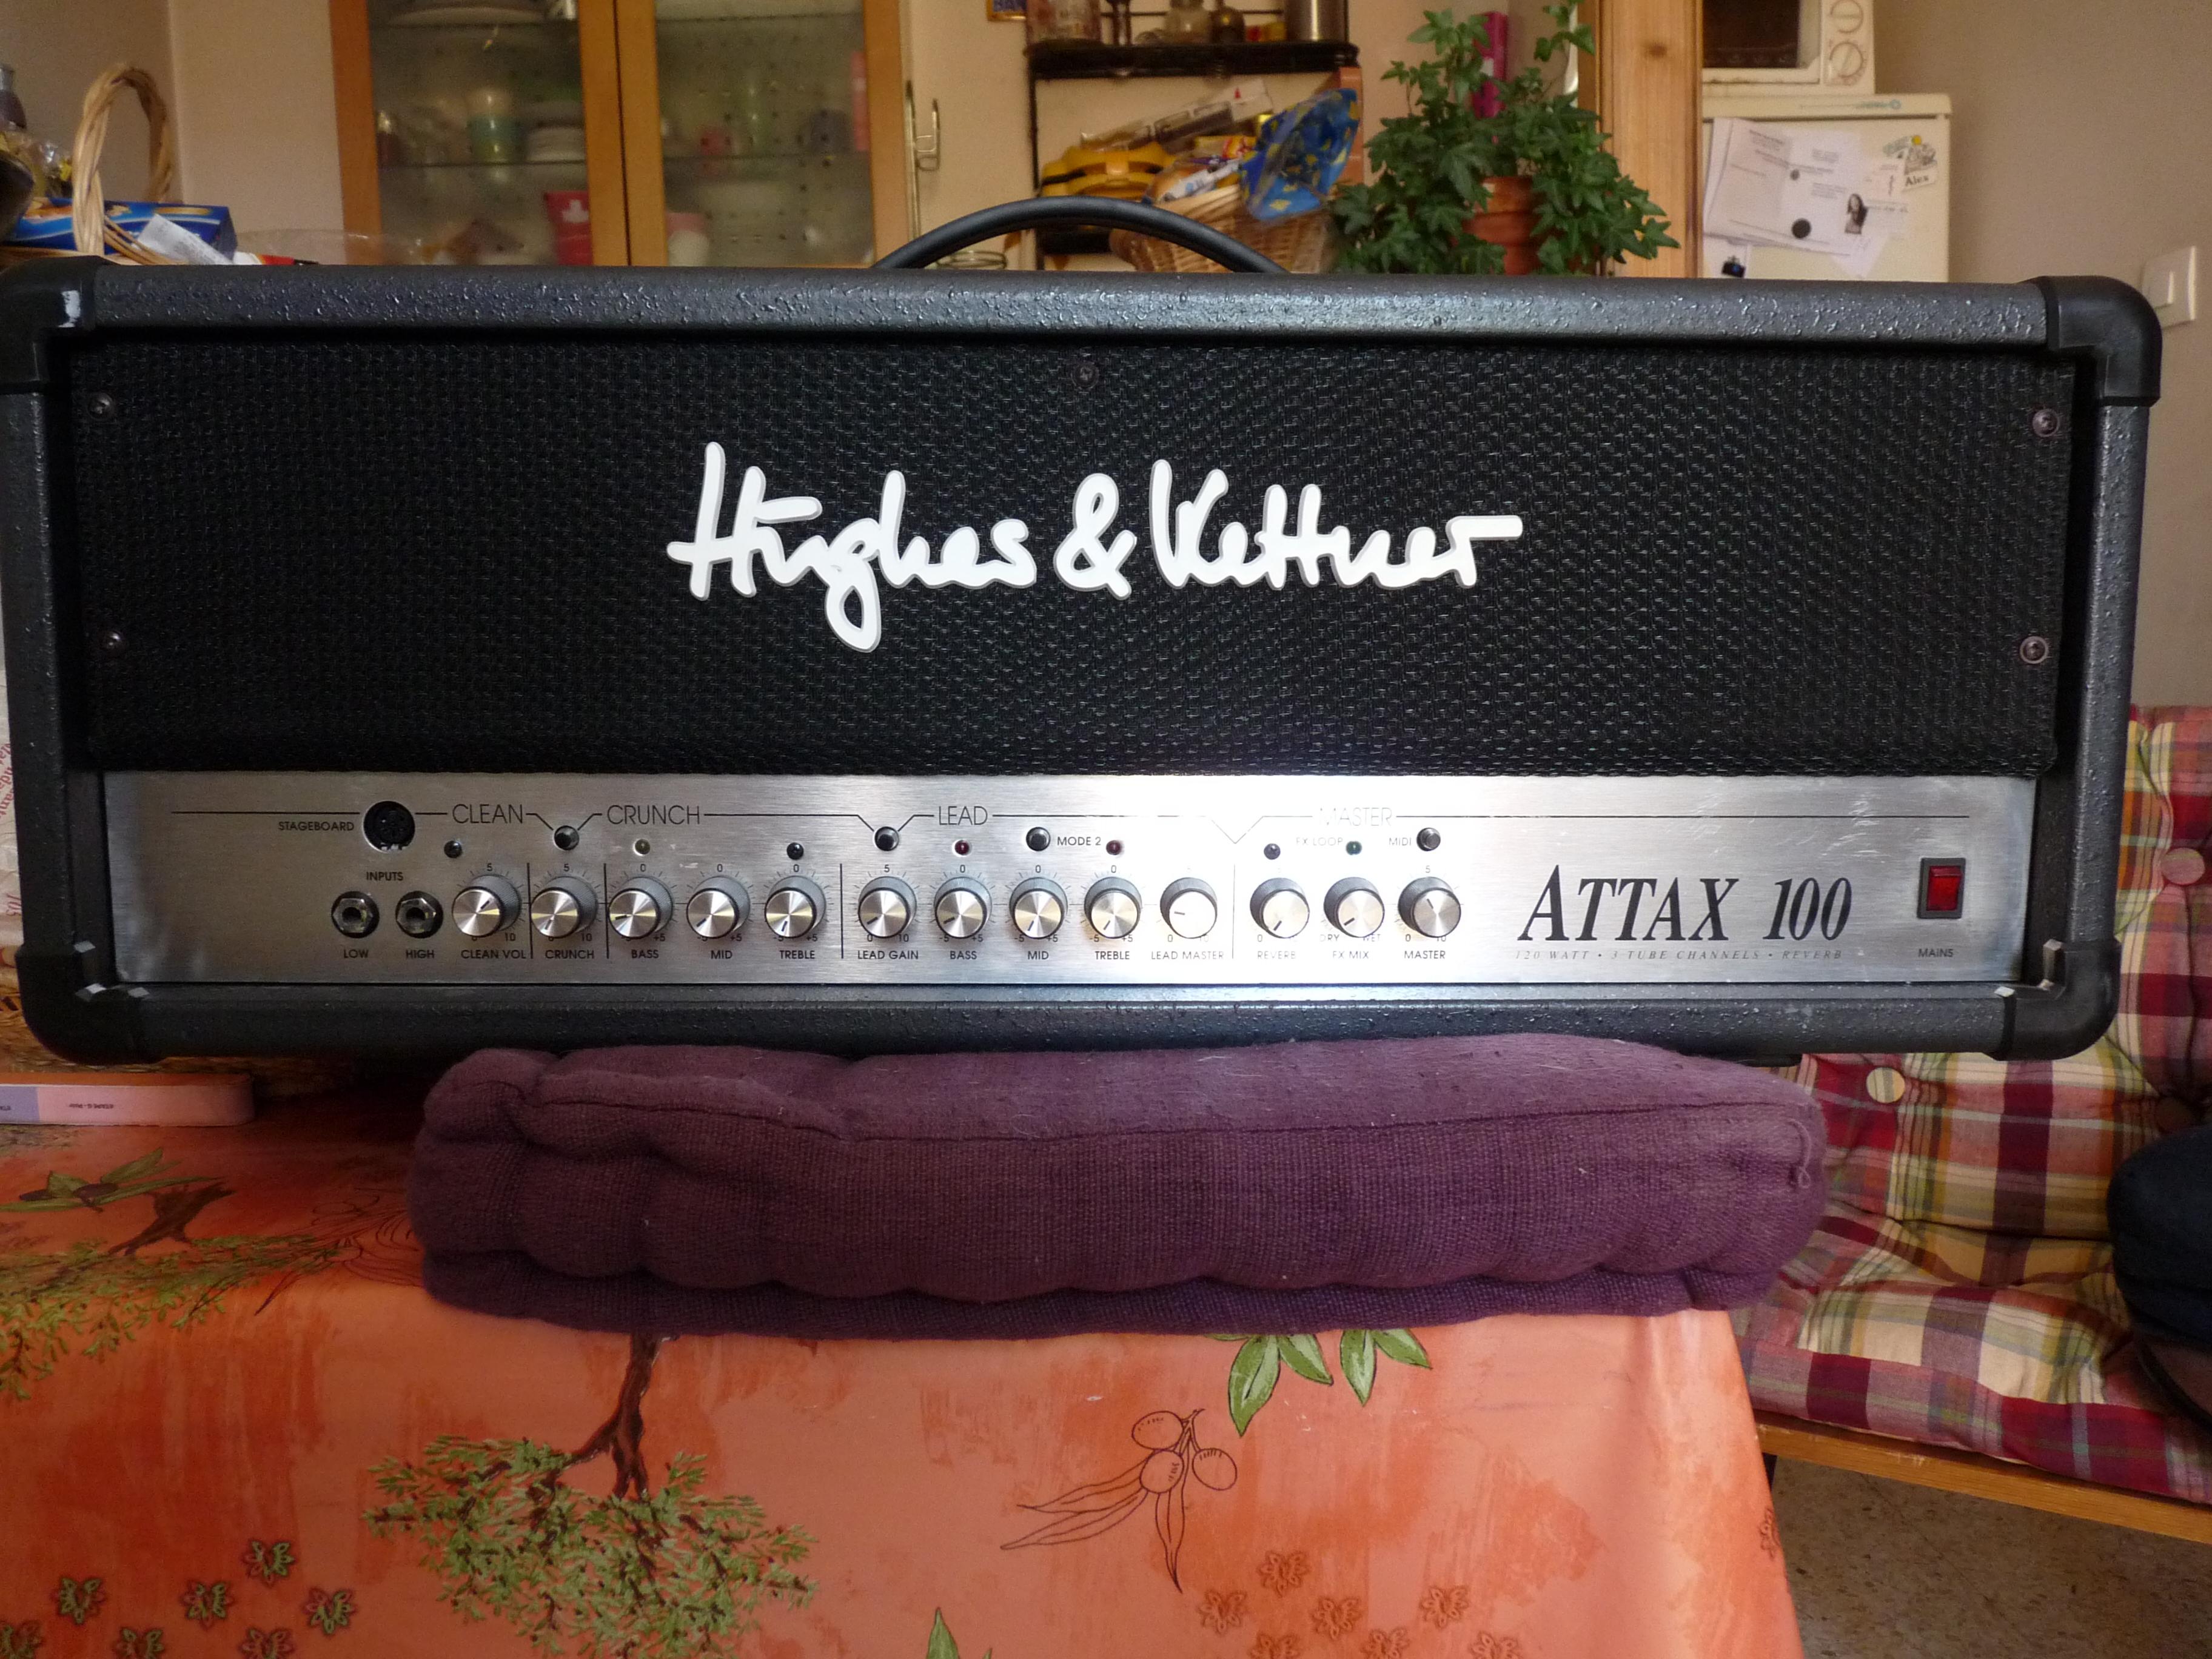 Hughes & Kettner Attax 100 Head image (#276759) - Audiofanzine